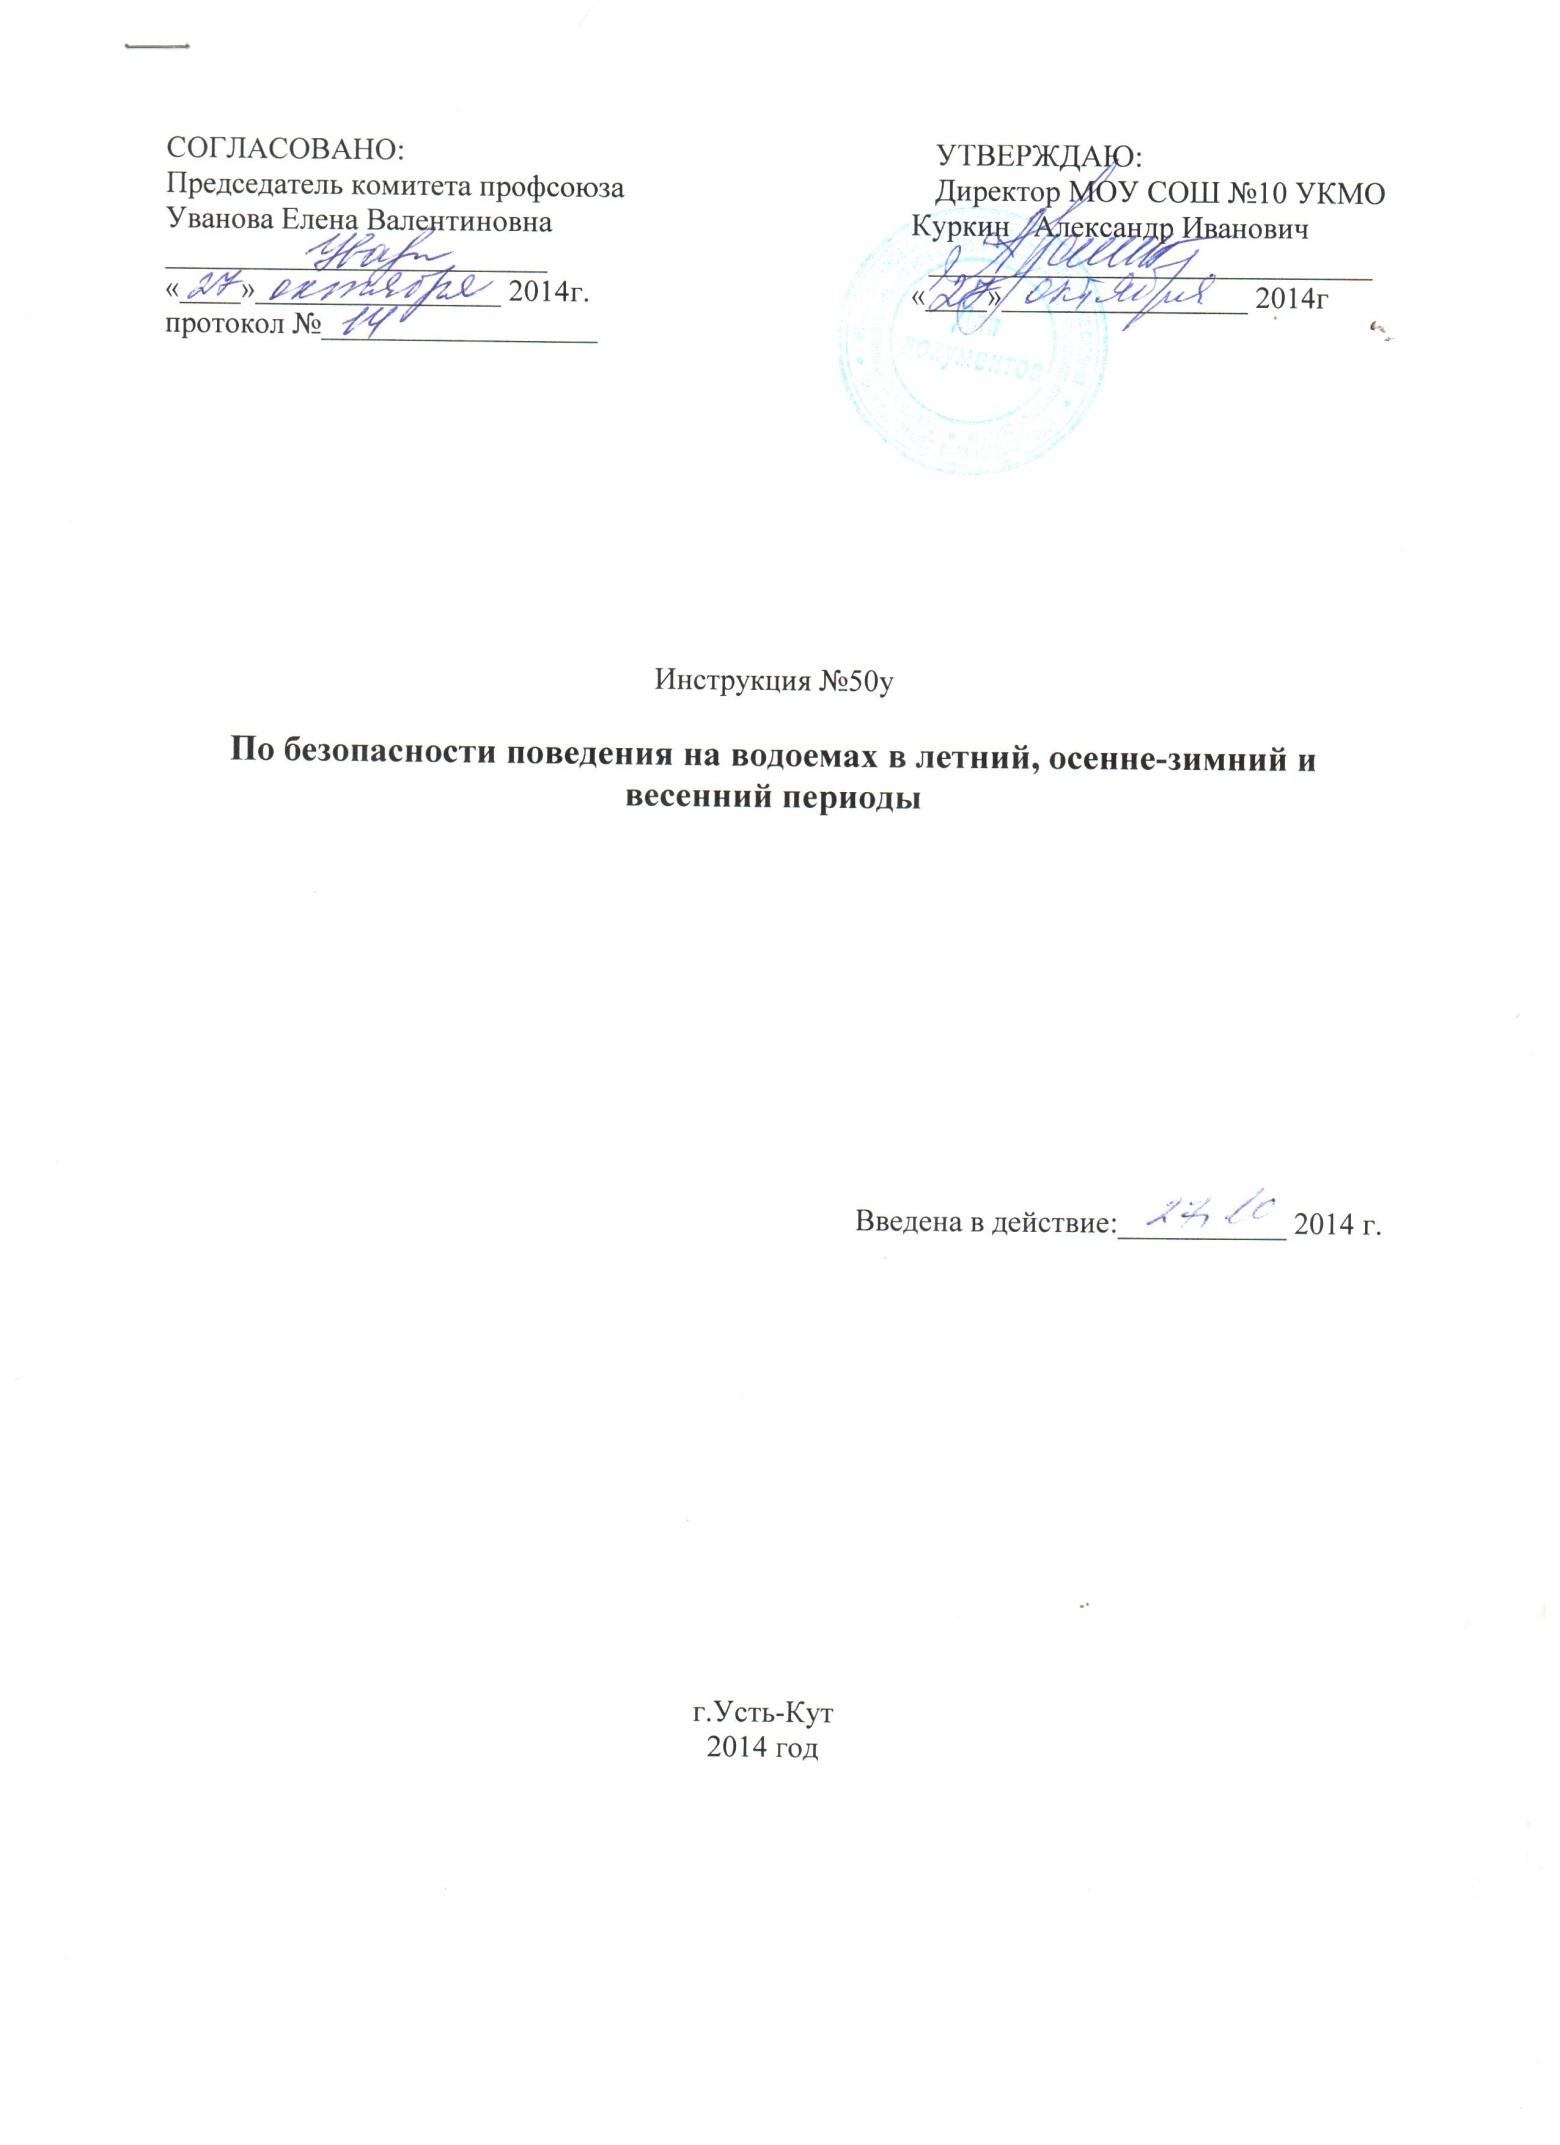 C:\Users\Admin\Documents\Scanned Documents\Рисунок (28).jpg